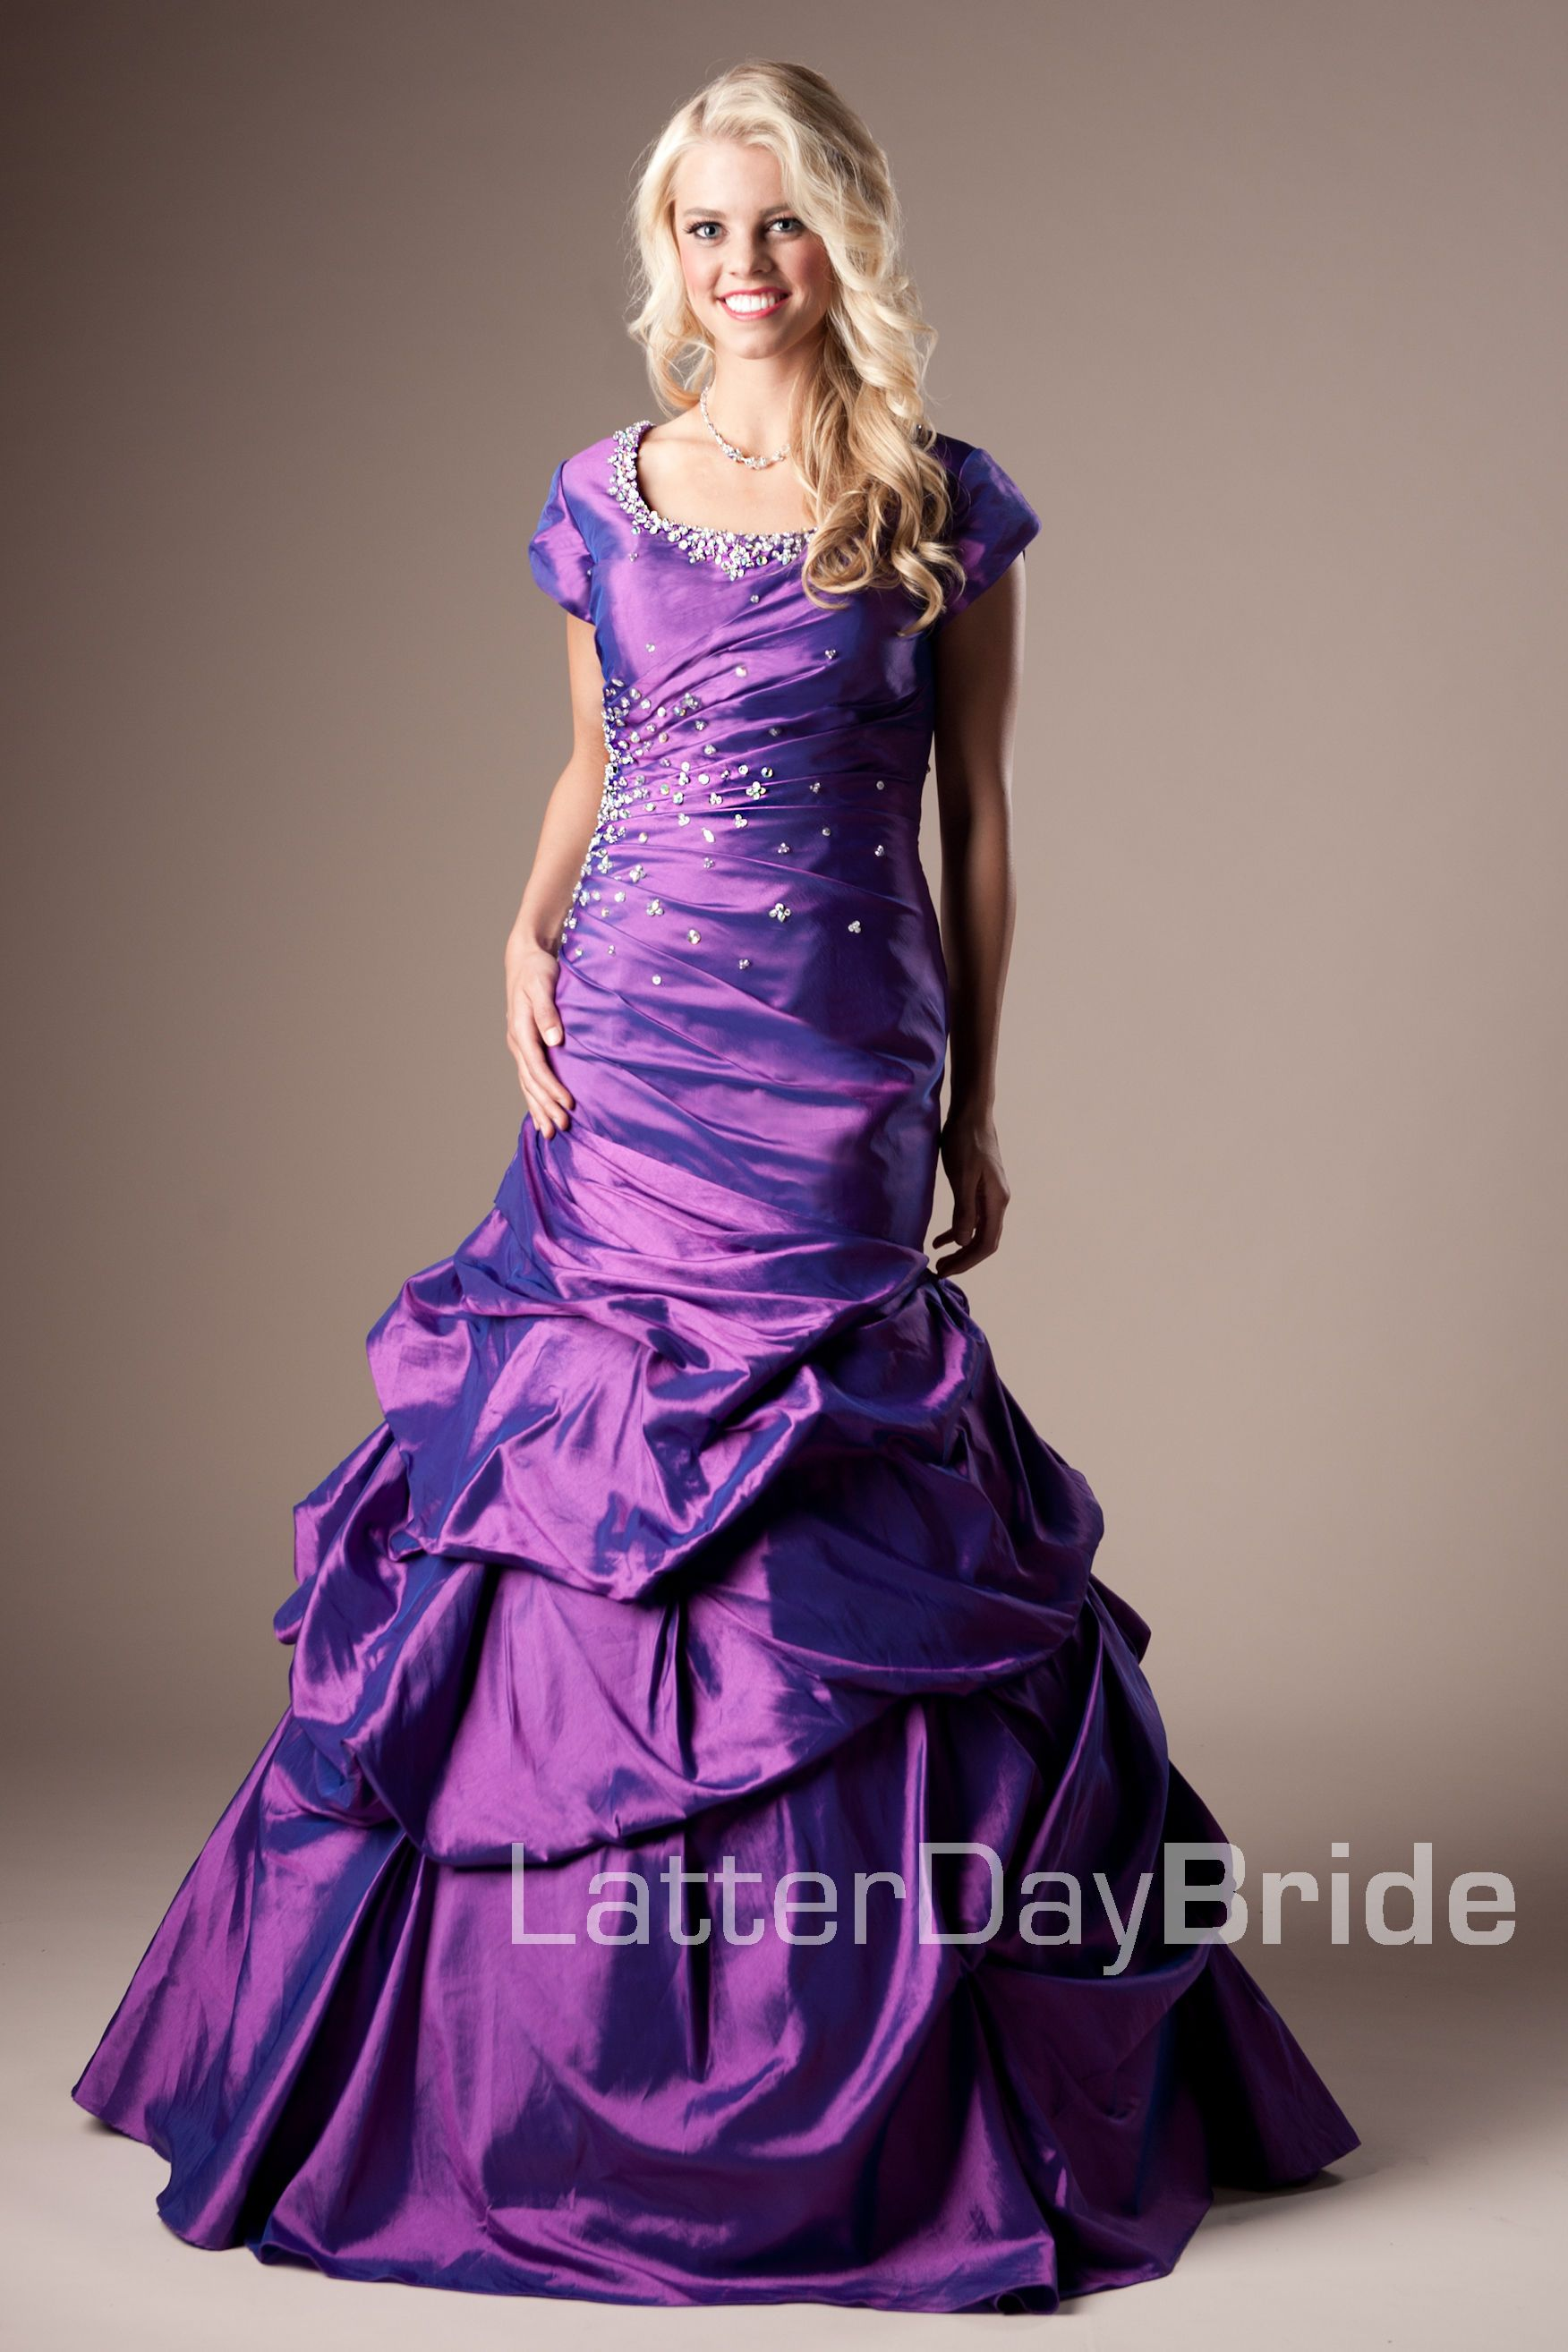 Bridesmaid & Prom, Tamara | LatterDayBride & Prom -Modest Mormon LDS ...